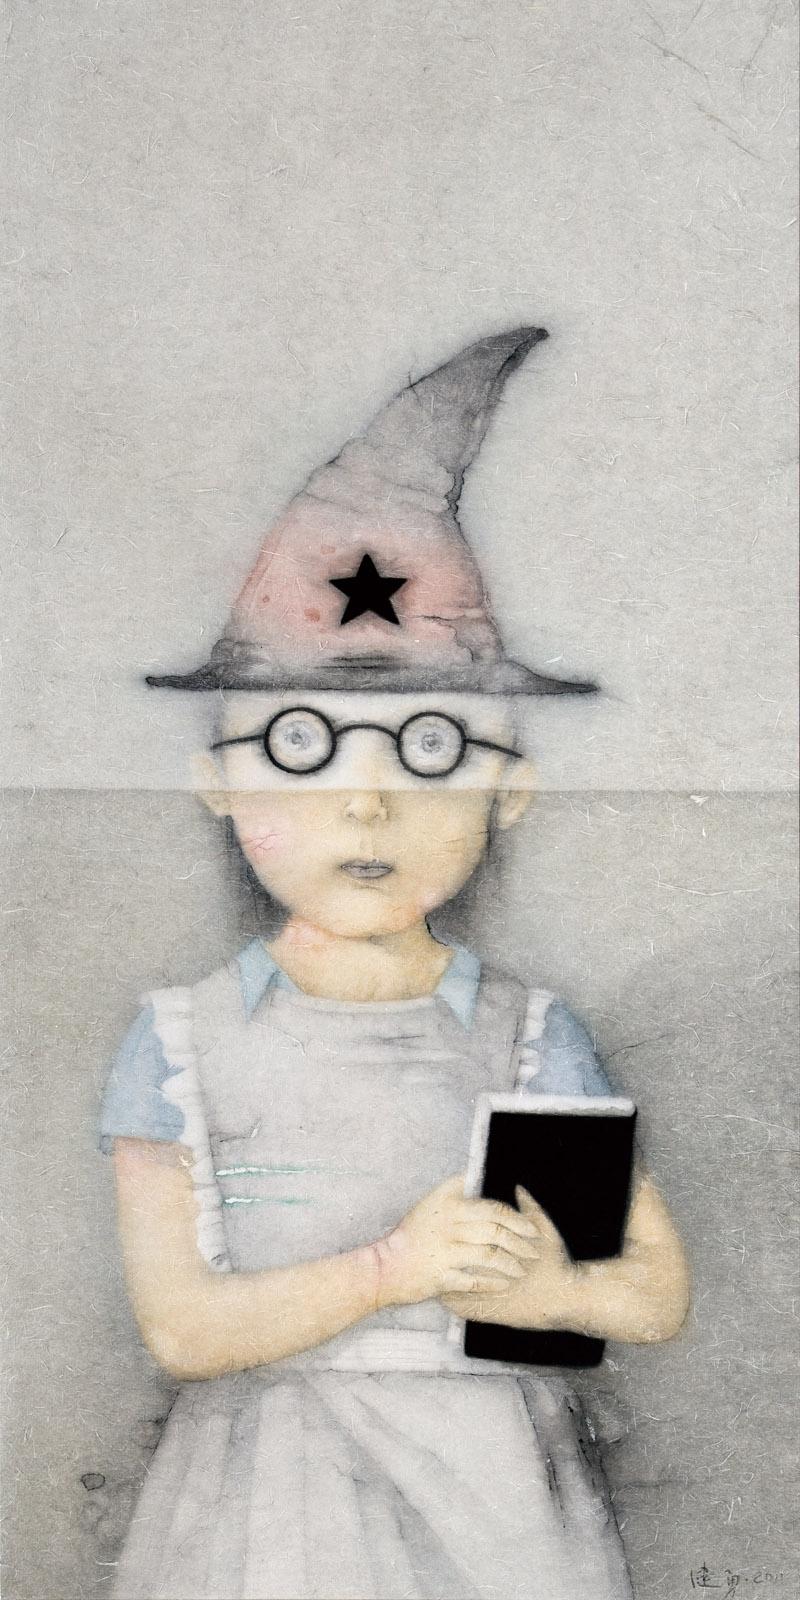 Zeng Jianyong 曾健勇, Cosplay - Enchanter 头号人物 - 魔法师, 2011, Ink and color on paper 纸本设色, 144 x 72 cm